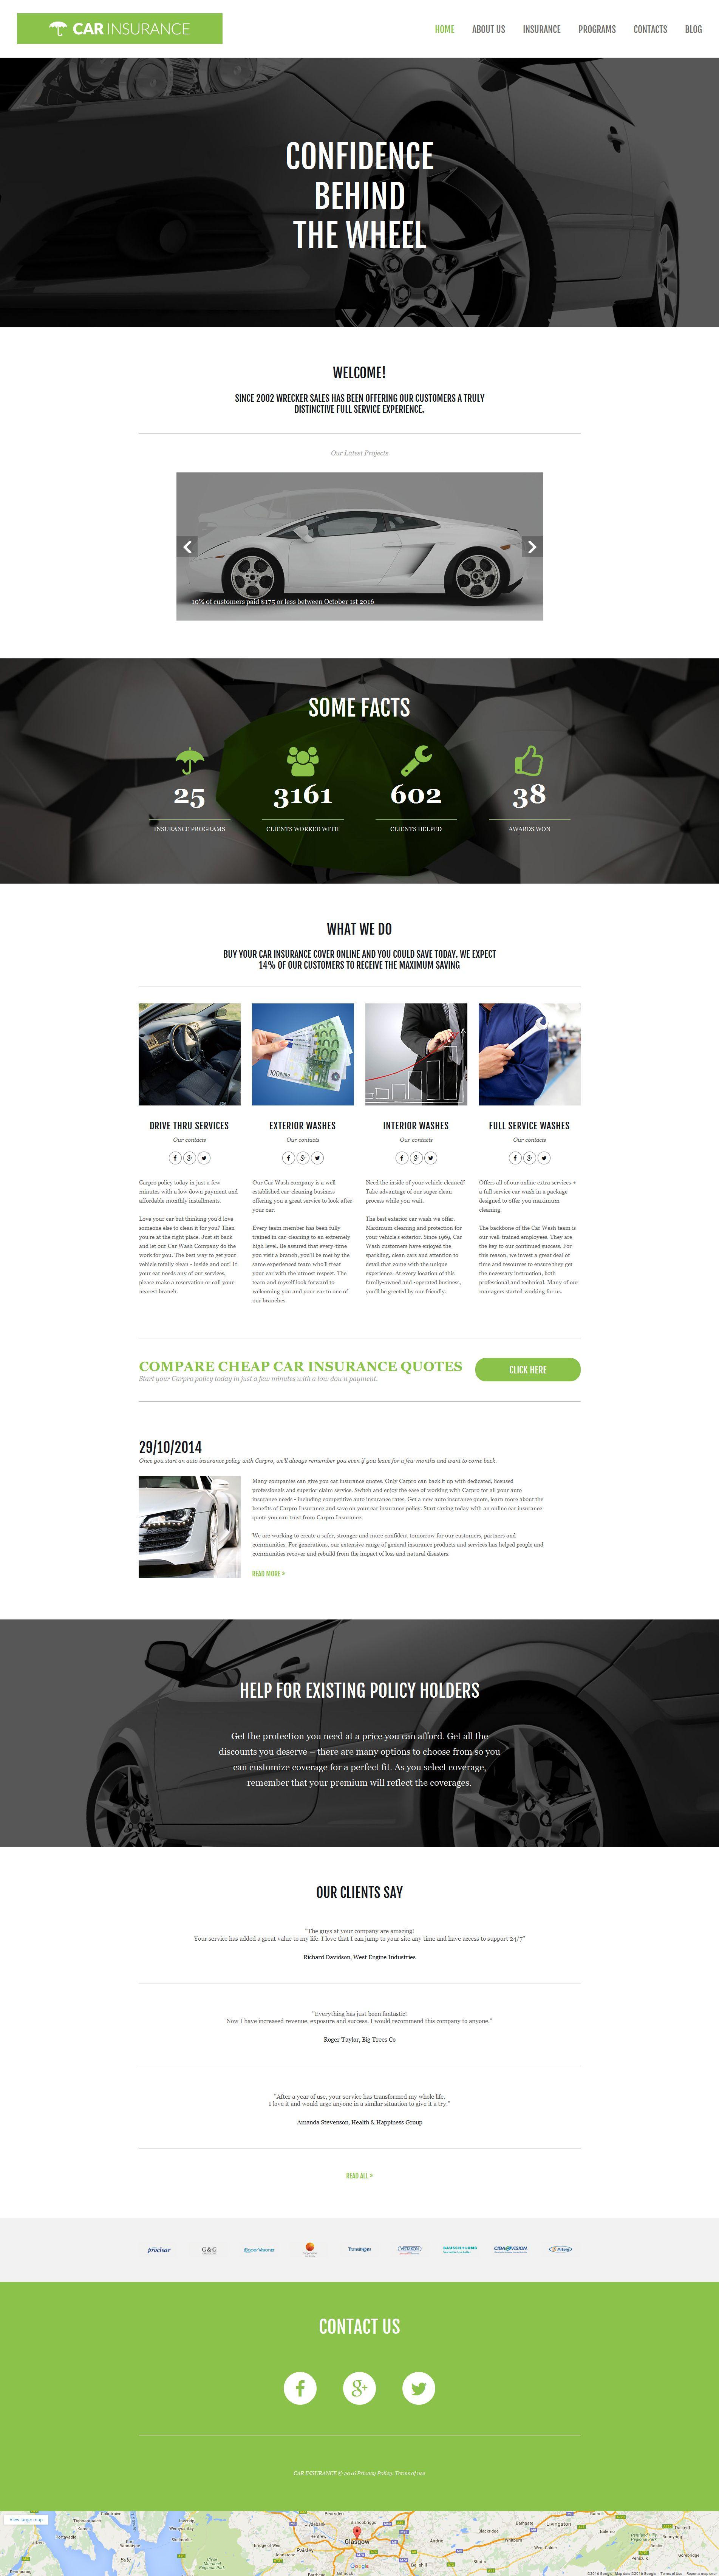 Car insurance responsive moto cms 3 template 58681